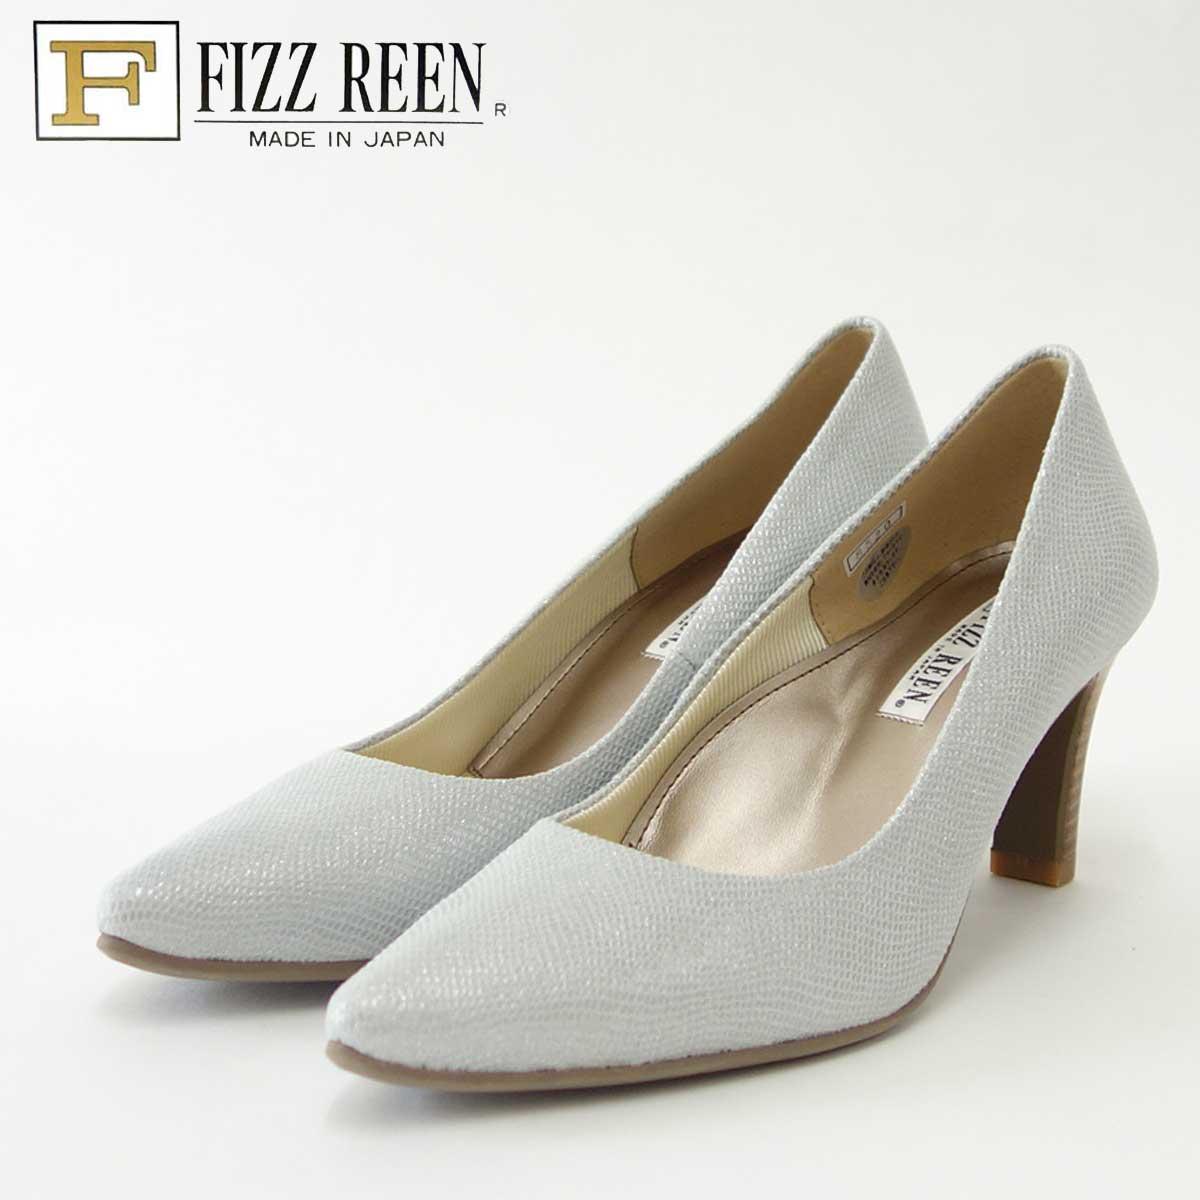 FIZZ REEN フィズリーン 8520 シルバー(レディース)スタイリッシュな快適パンプス「靴」